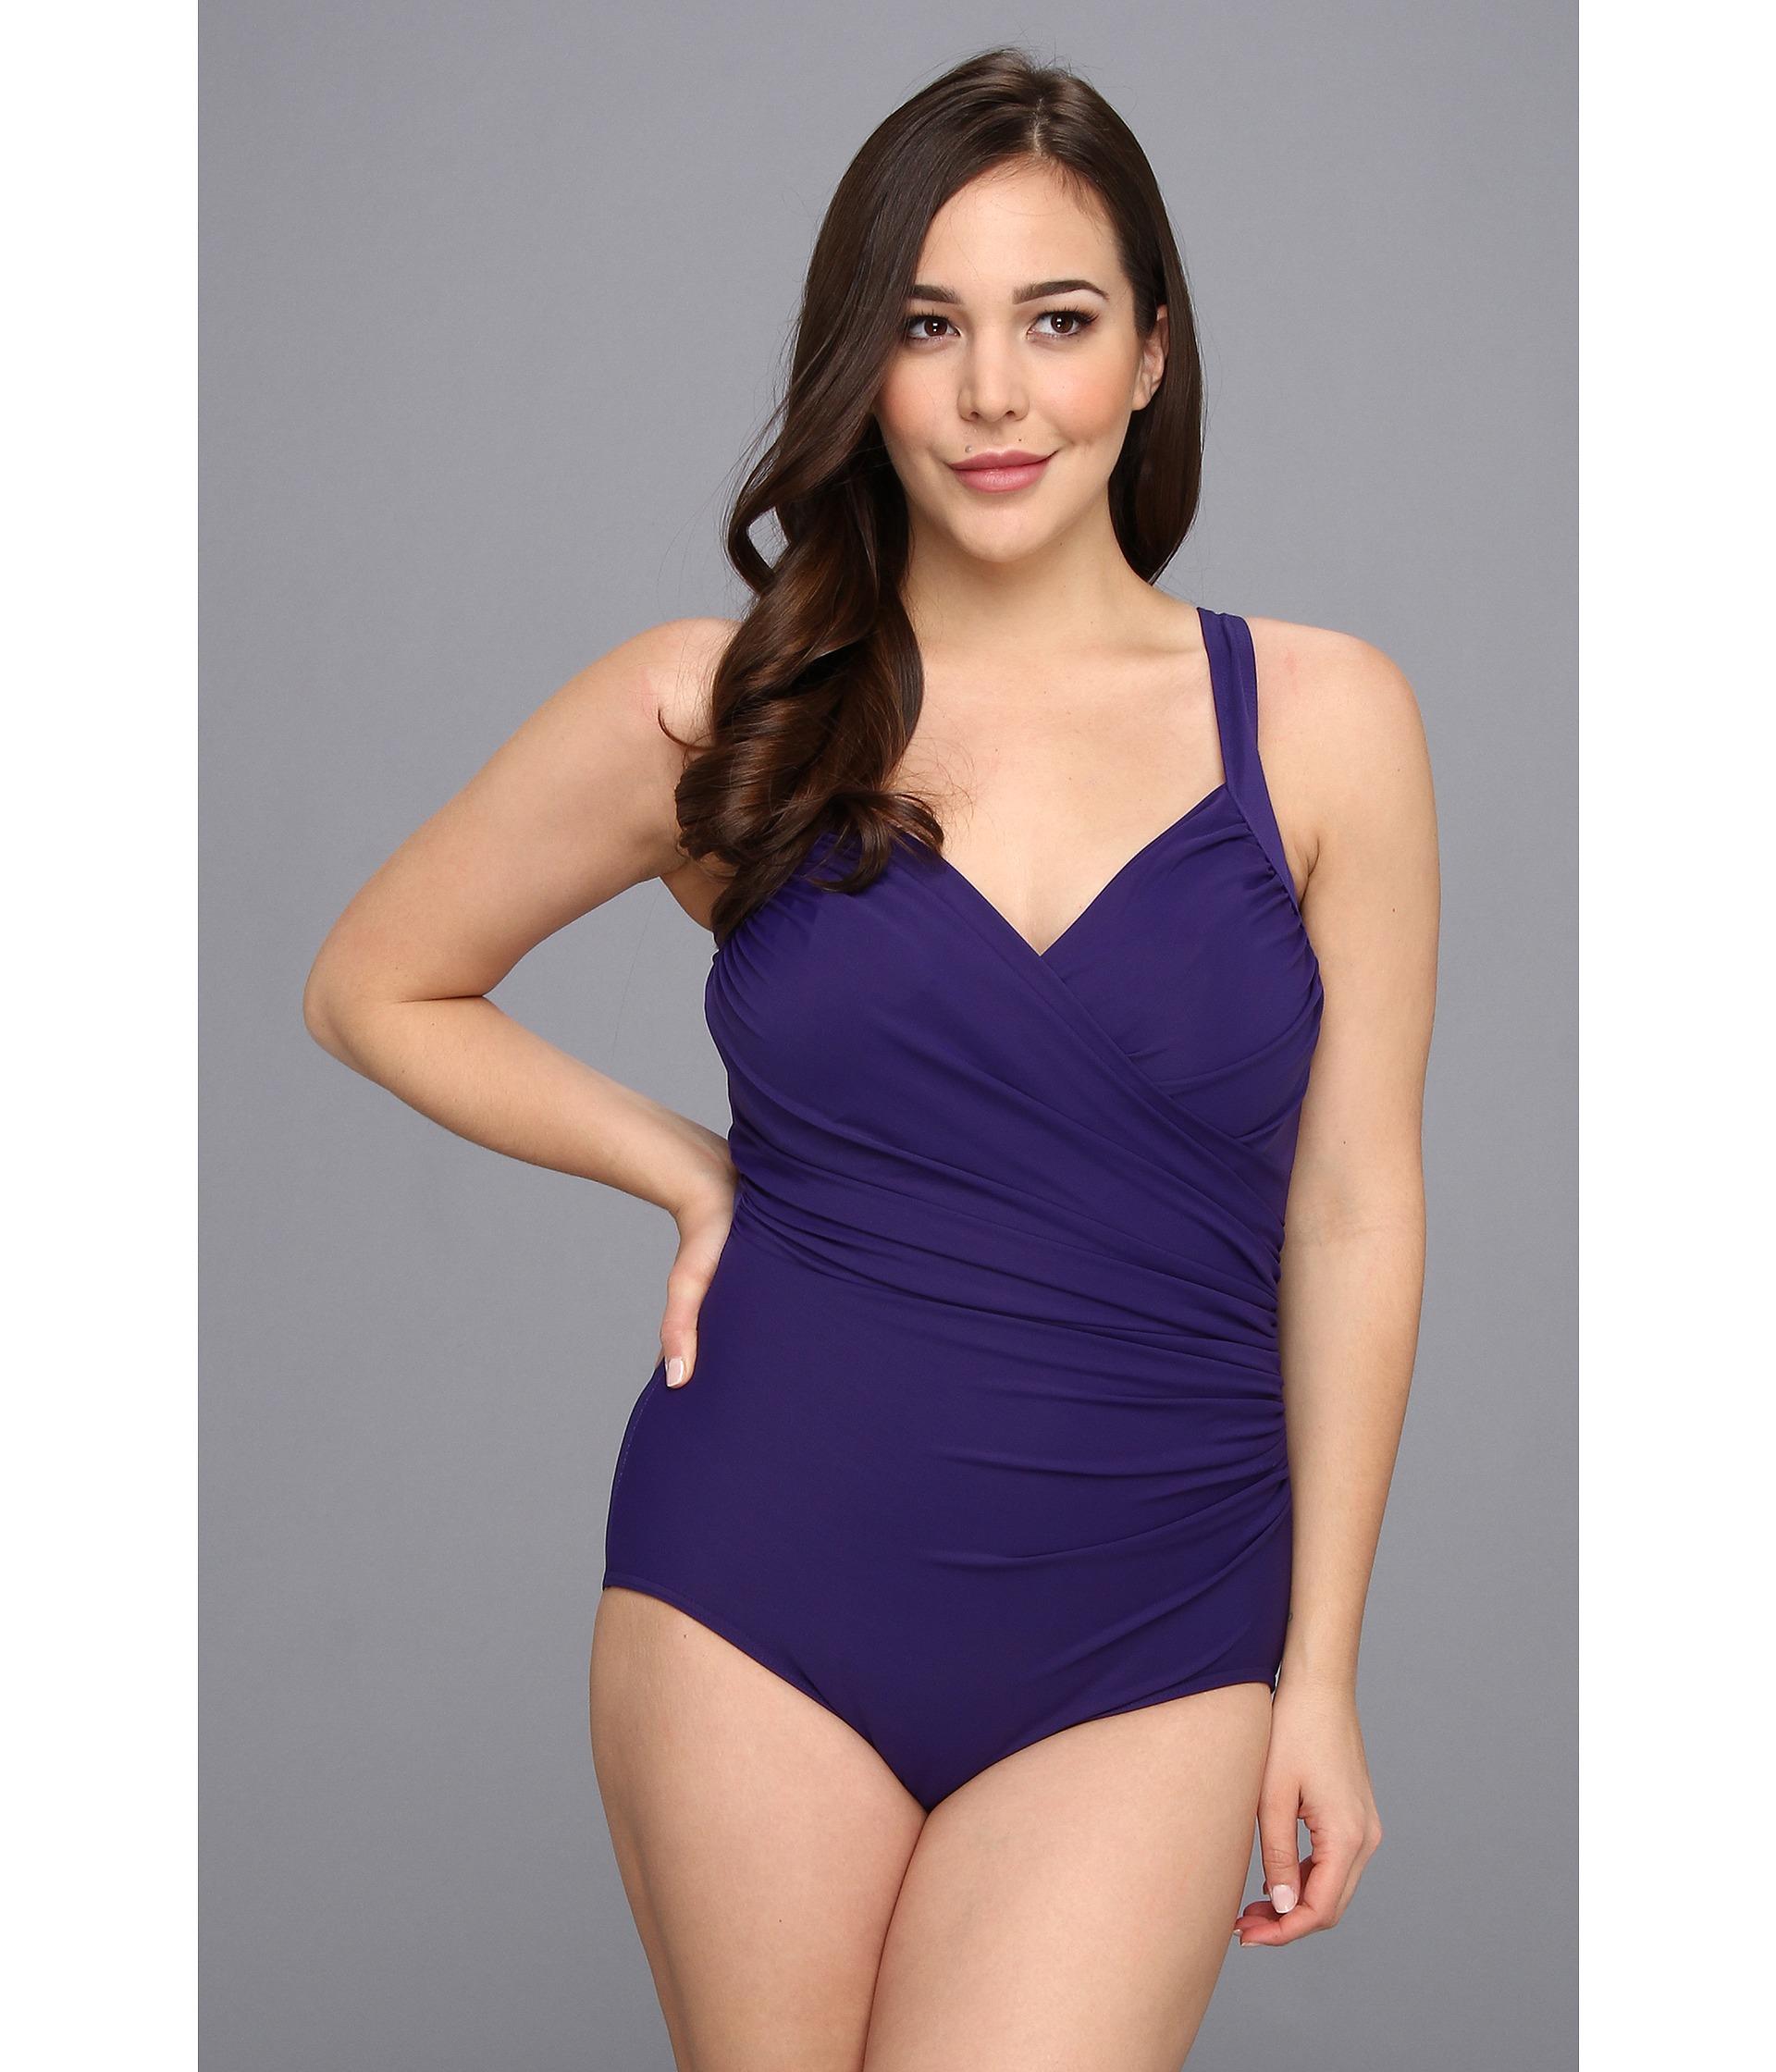 a91c8e8797d Miraclesuit Plus Size Sanibel Onepiece in Purple - Lyst